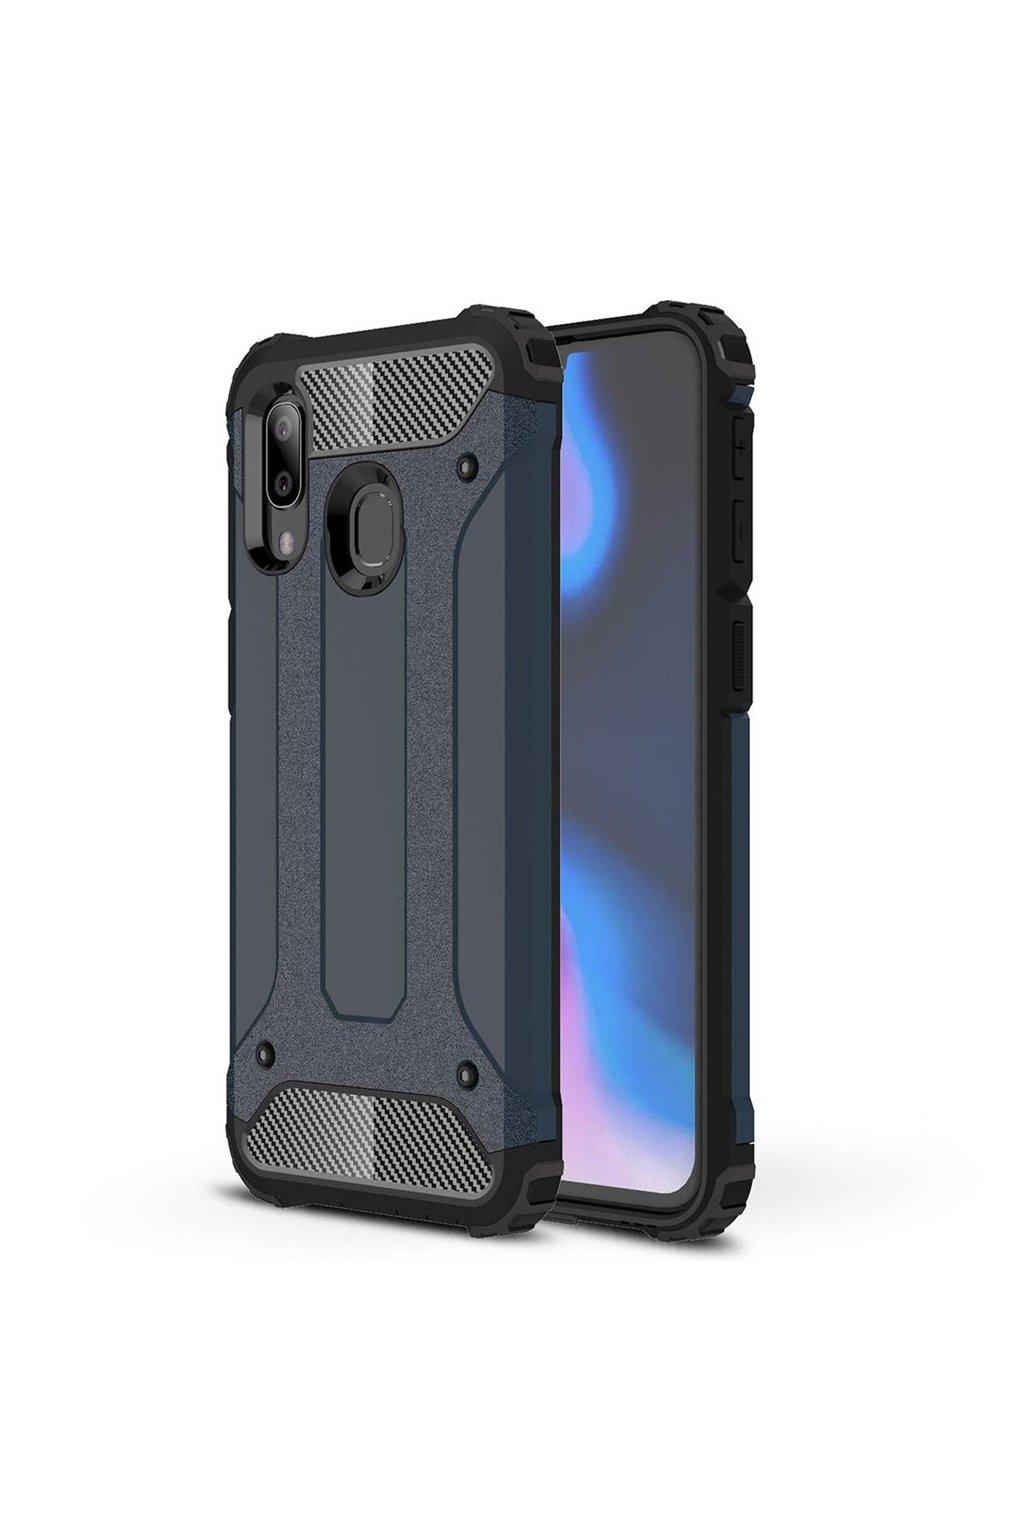 eng pl Hybrid Armor Case Tough Rugged Cover for Samsung Galaxy A40 blue 50375 1